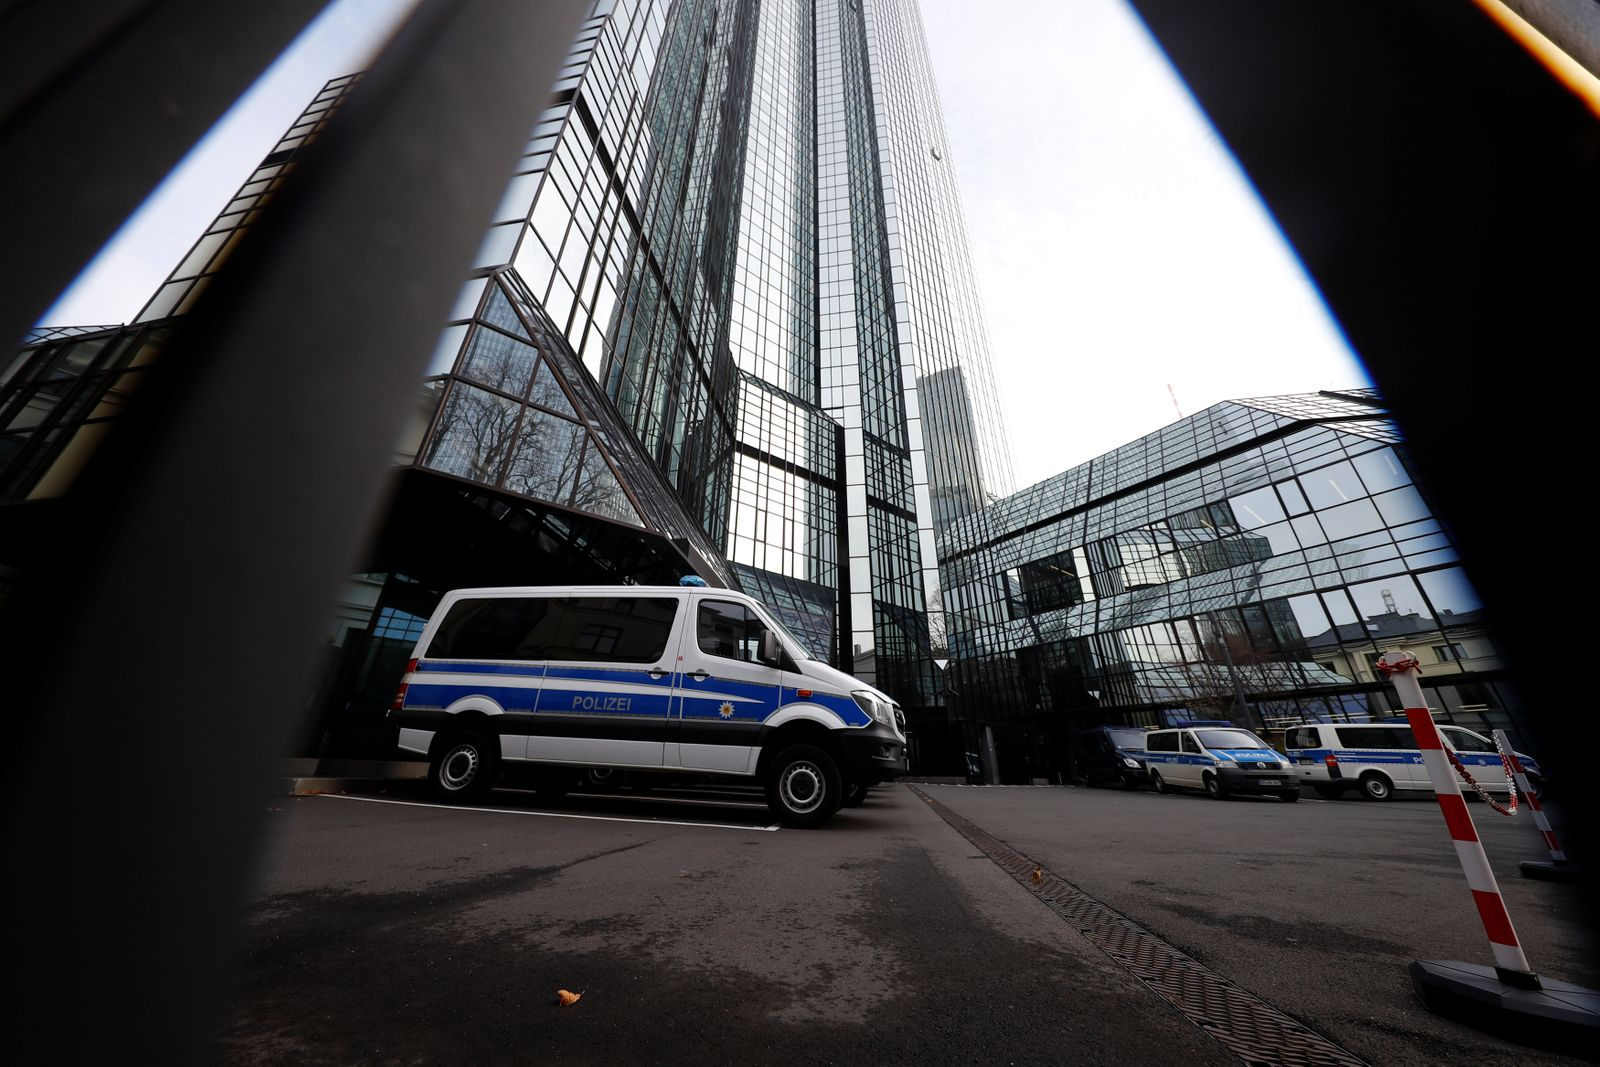 Deutsche Bank / Razzia